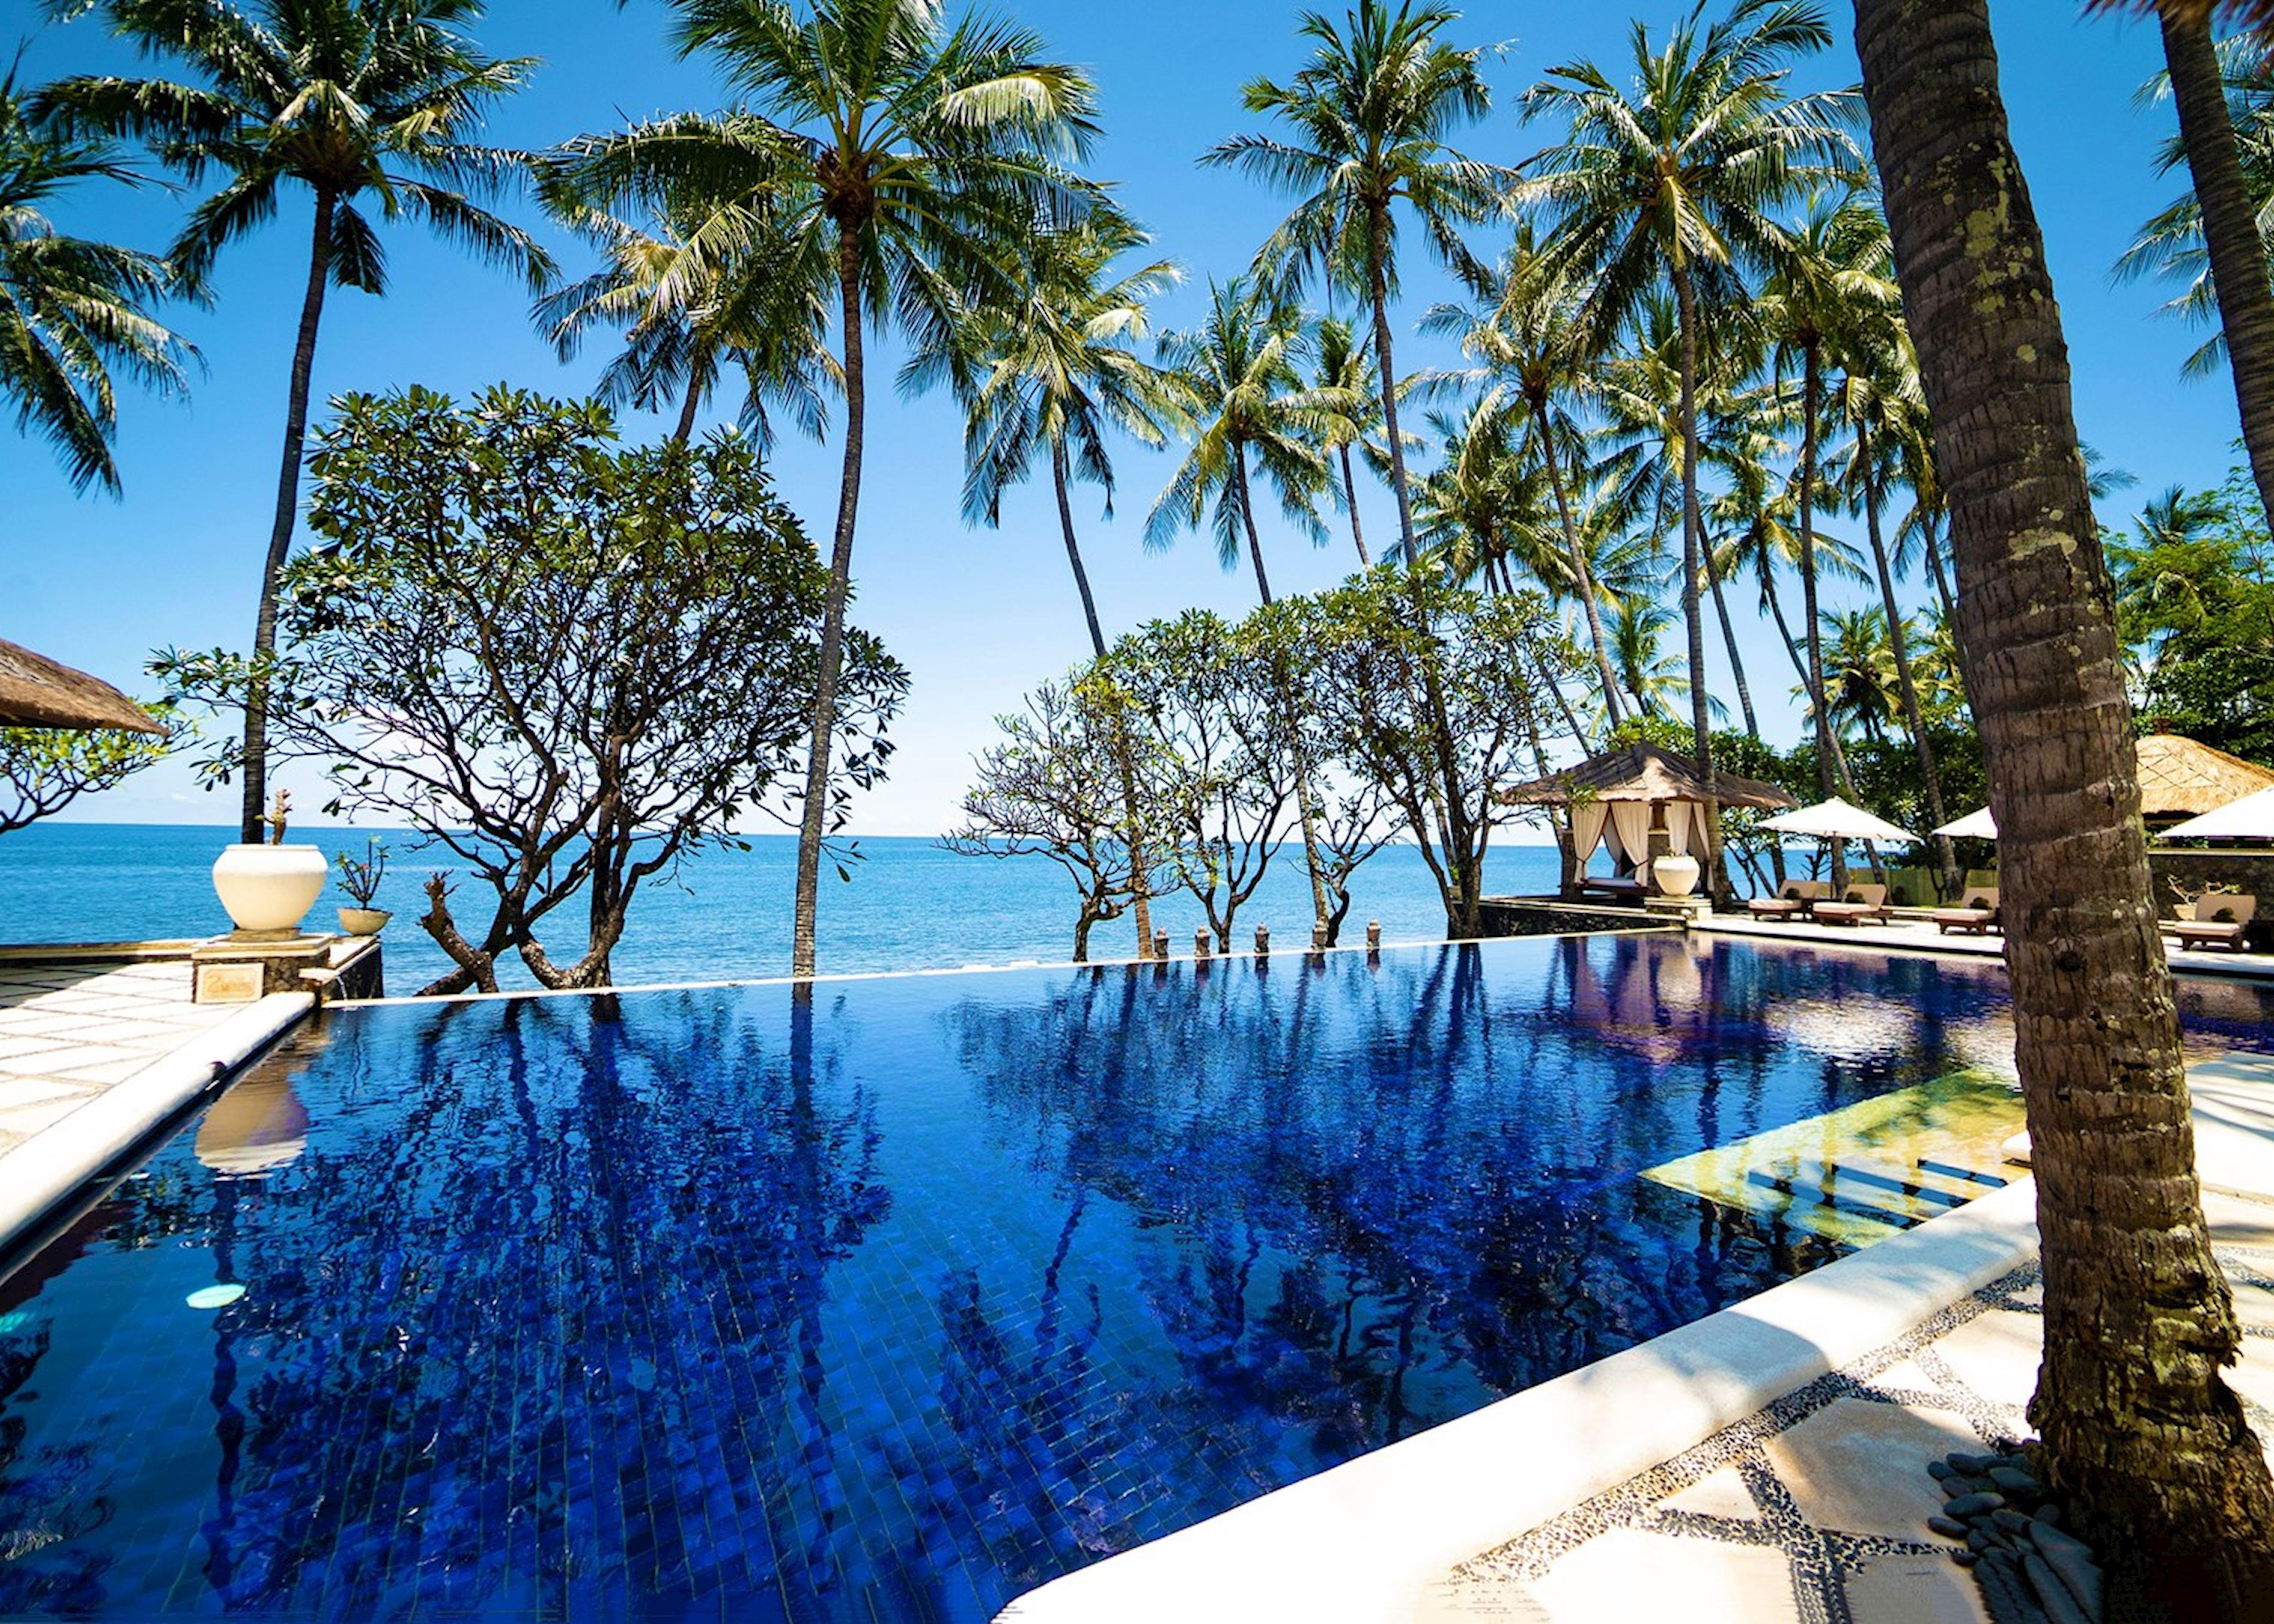 Spa Village Resort Tembok Bali Hotels In Tembok Audley Travel